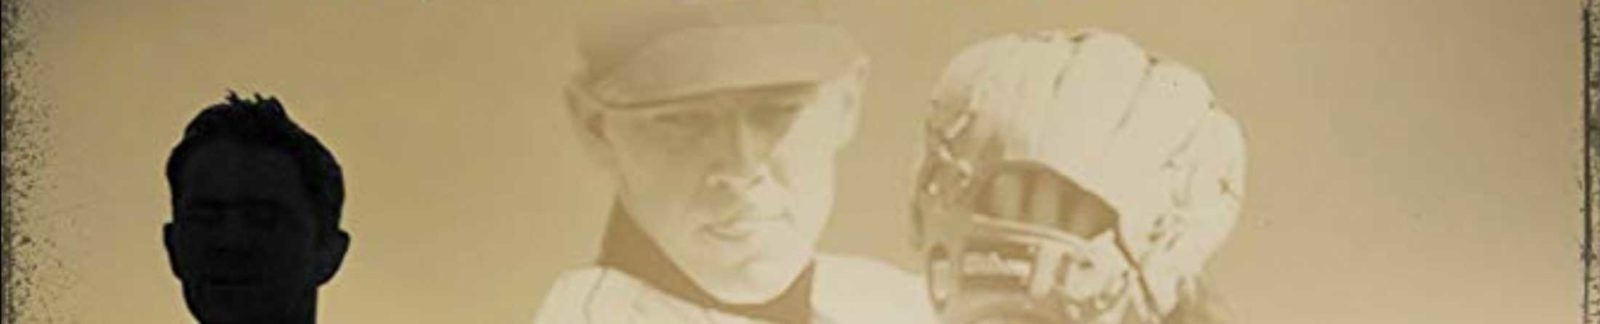 A Soldier's Story: Major Stephen Reich - Baseball Movie header